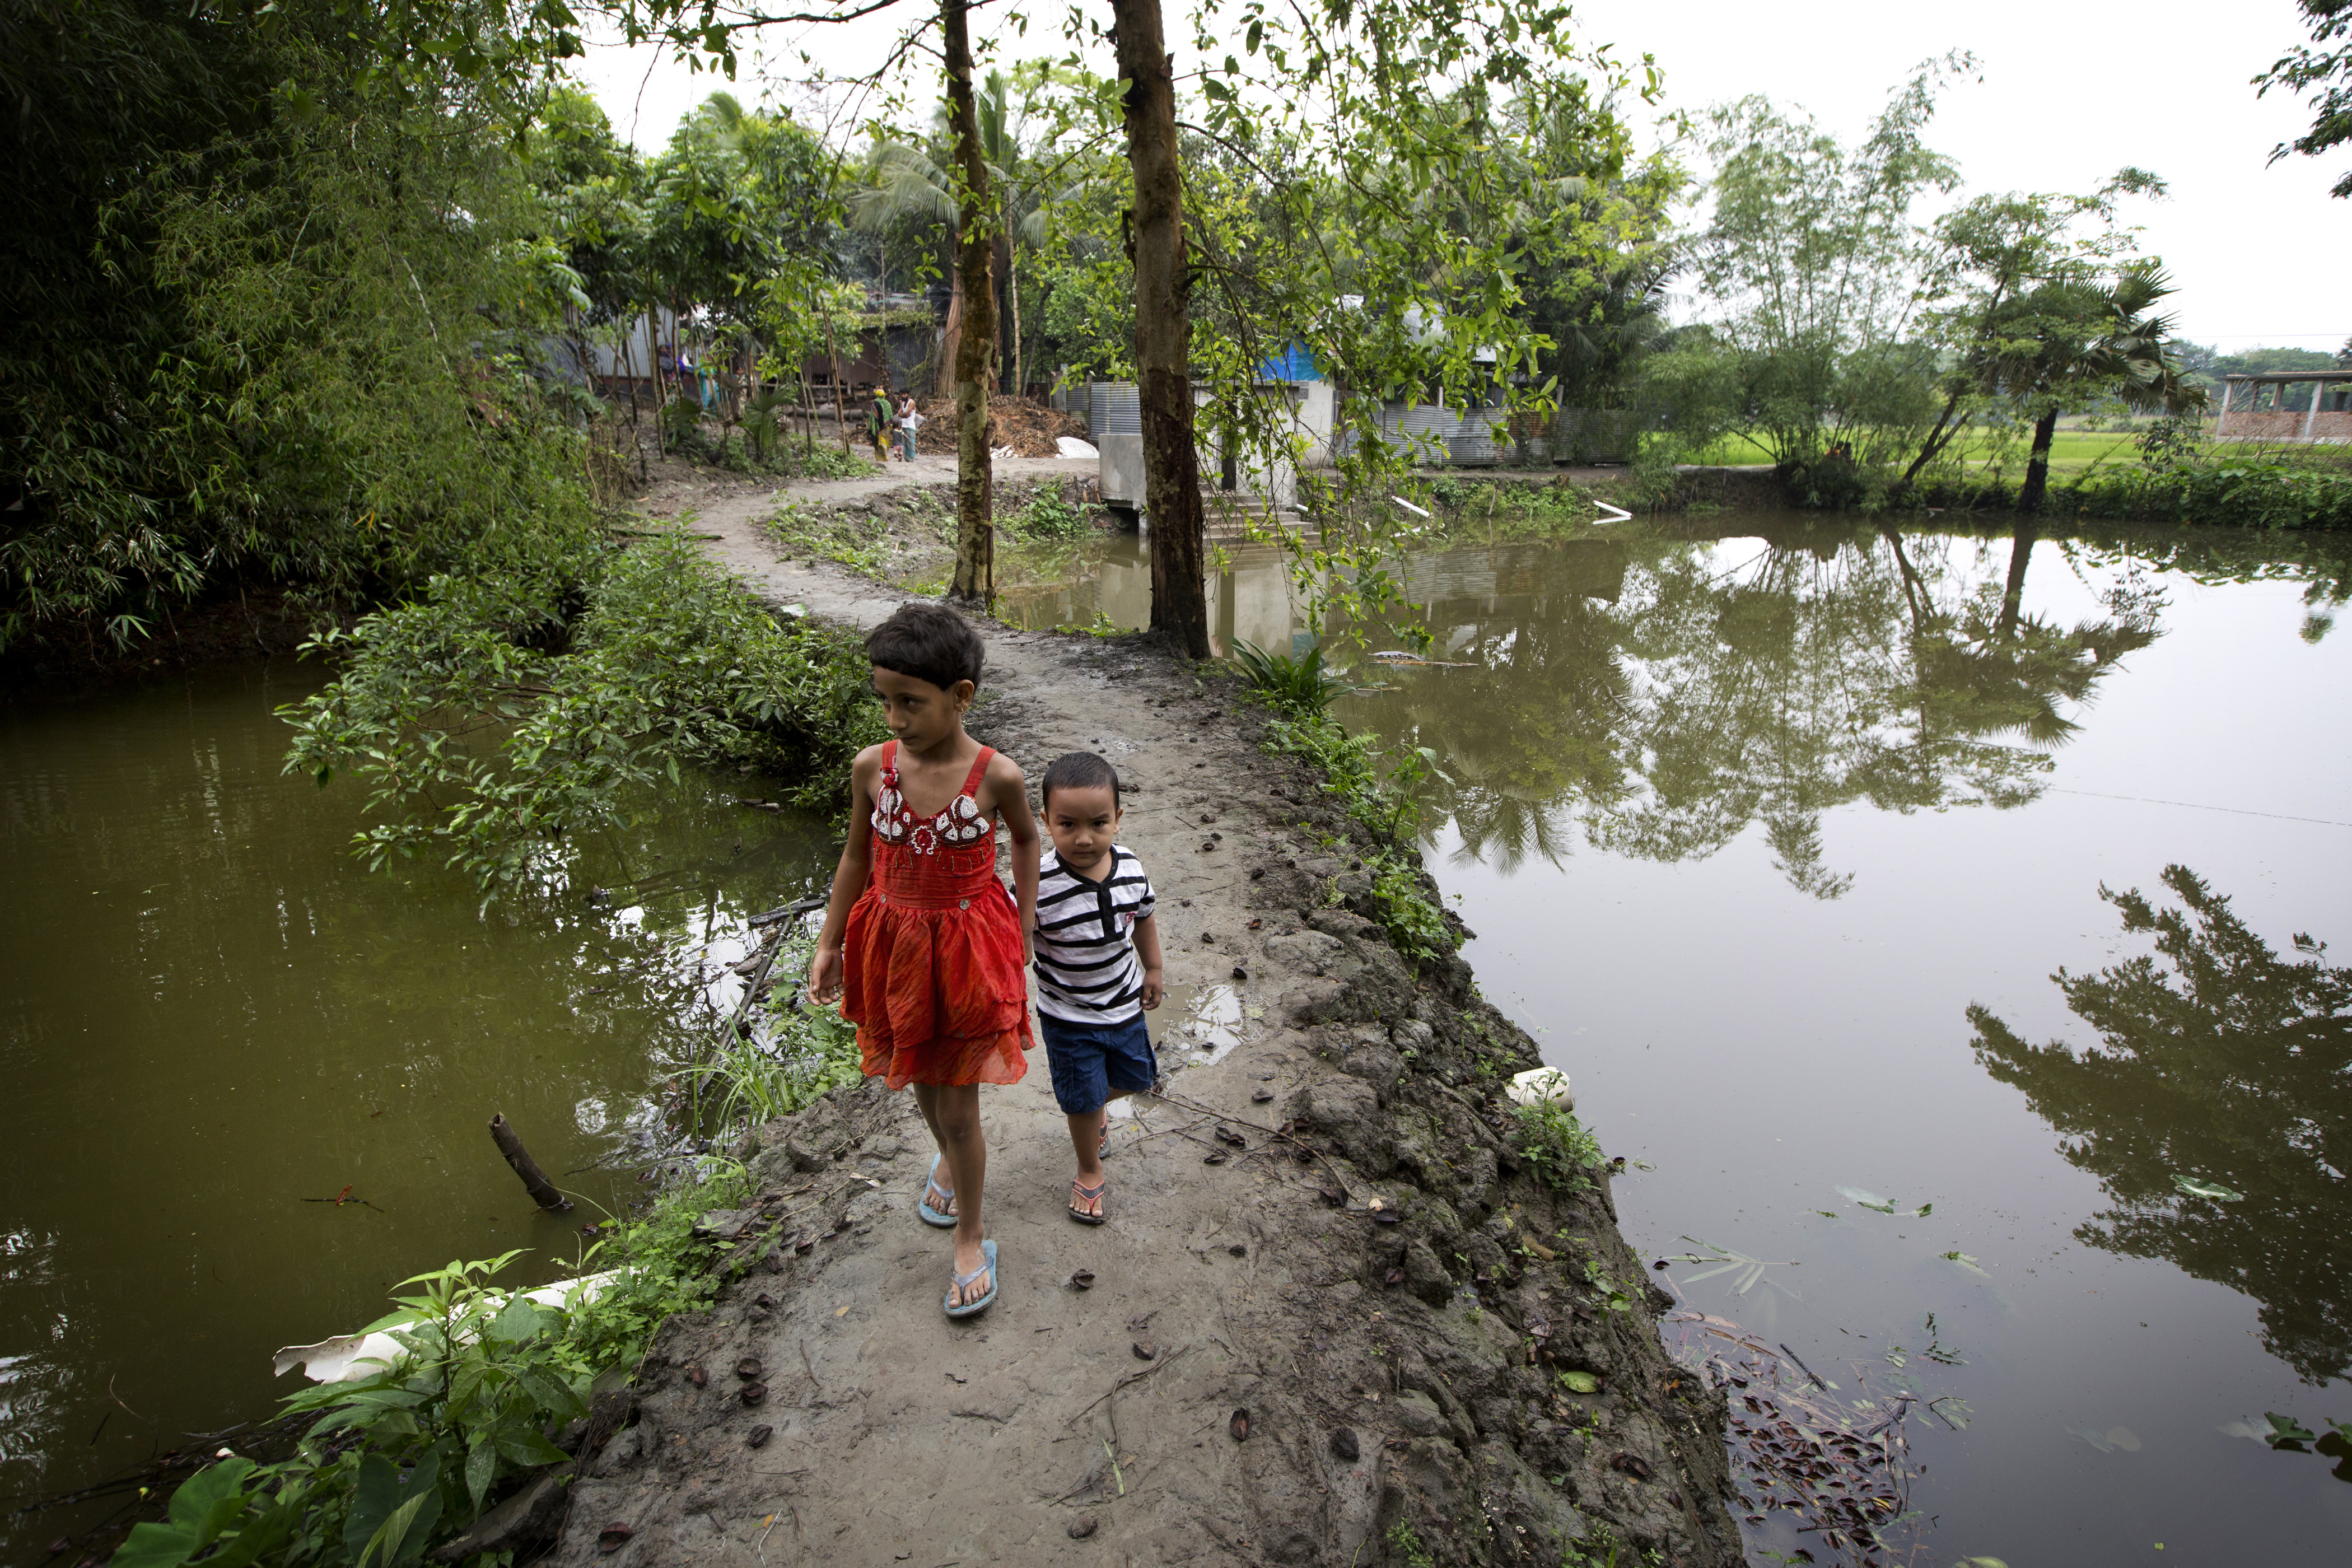 Bangladesh Children Drowning Prevention Program Bloomberg Philanthropies